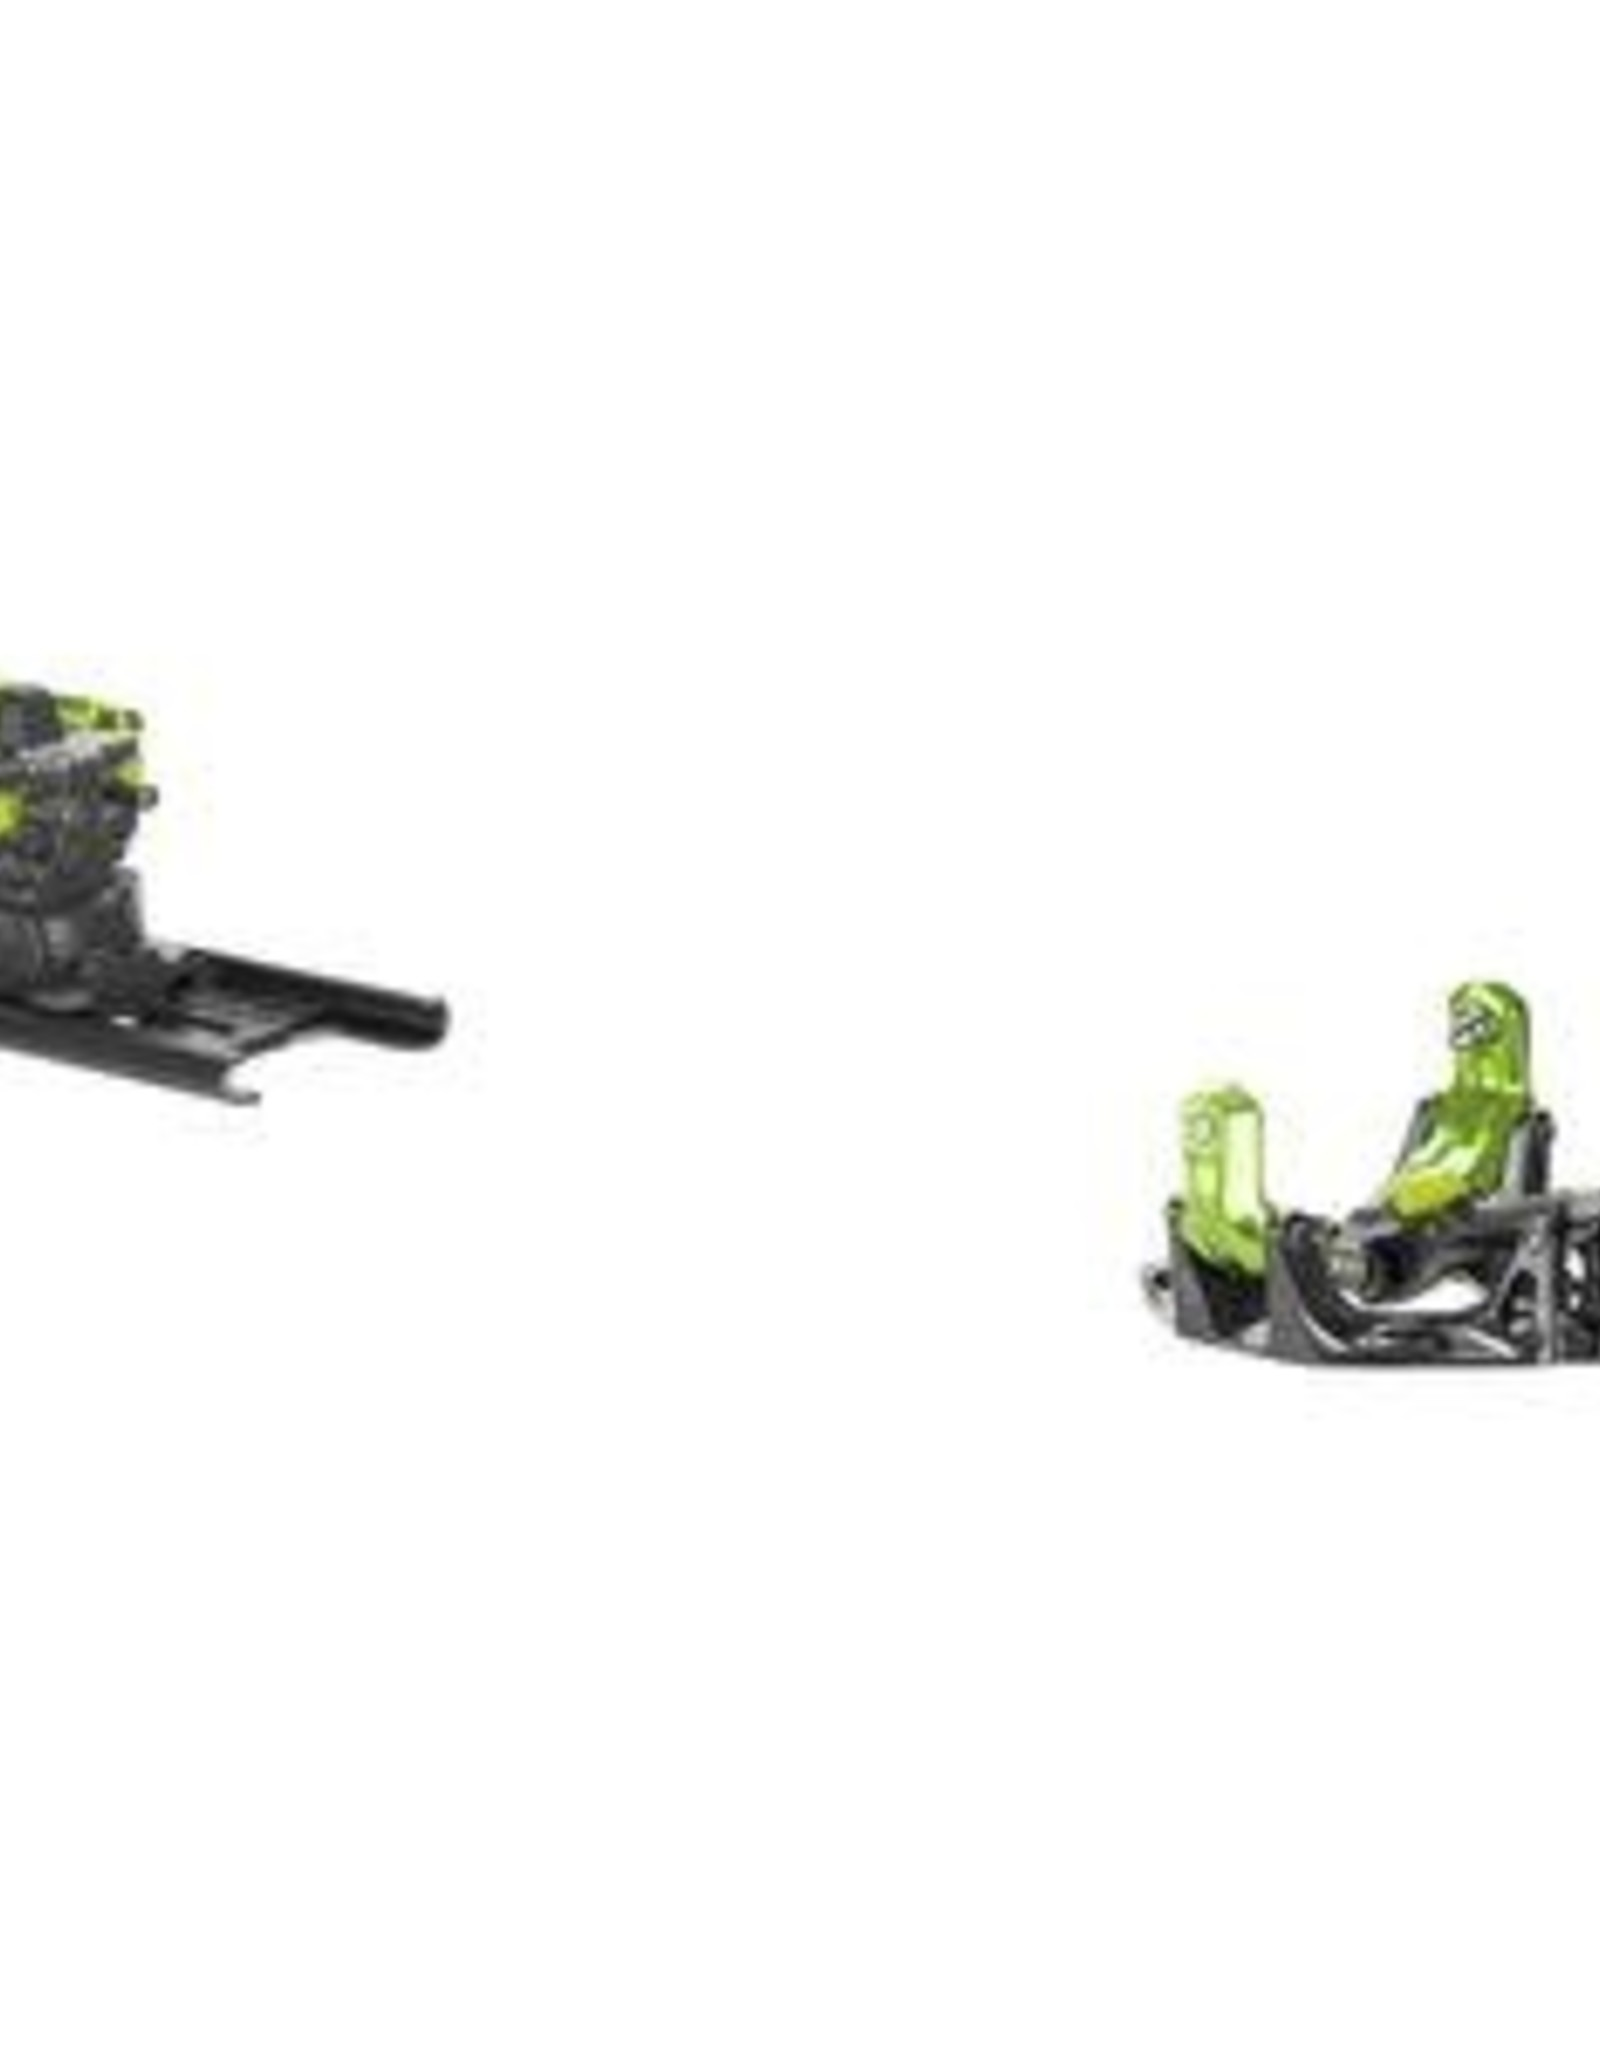 G3 G3 ZED 12 Binding (No Brakes)